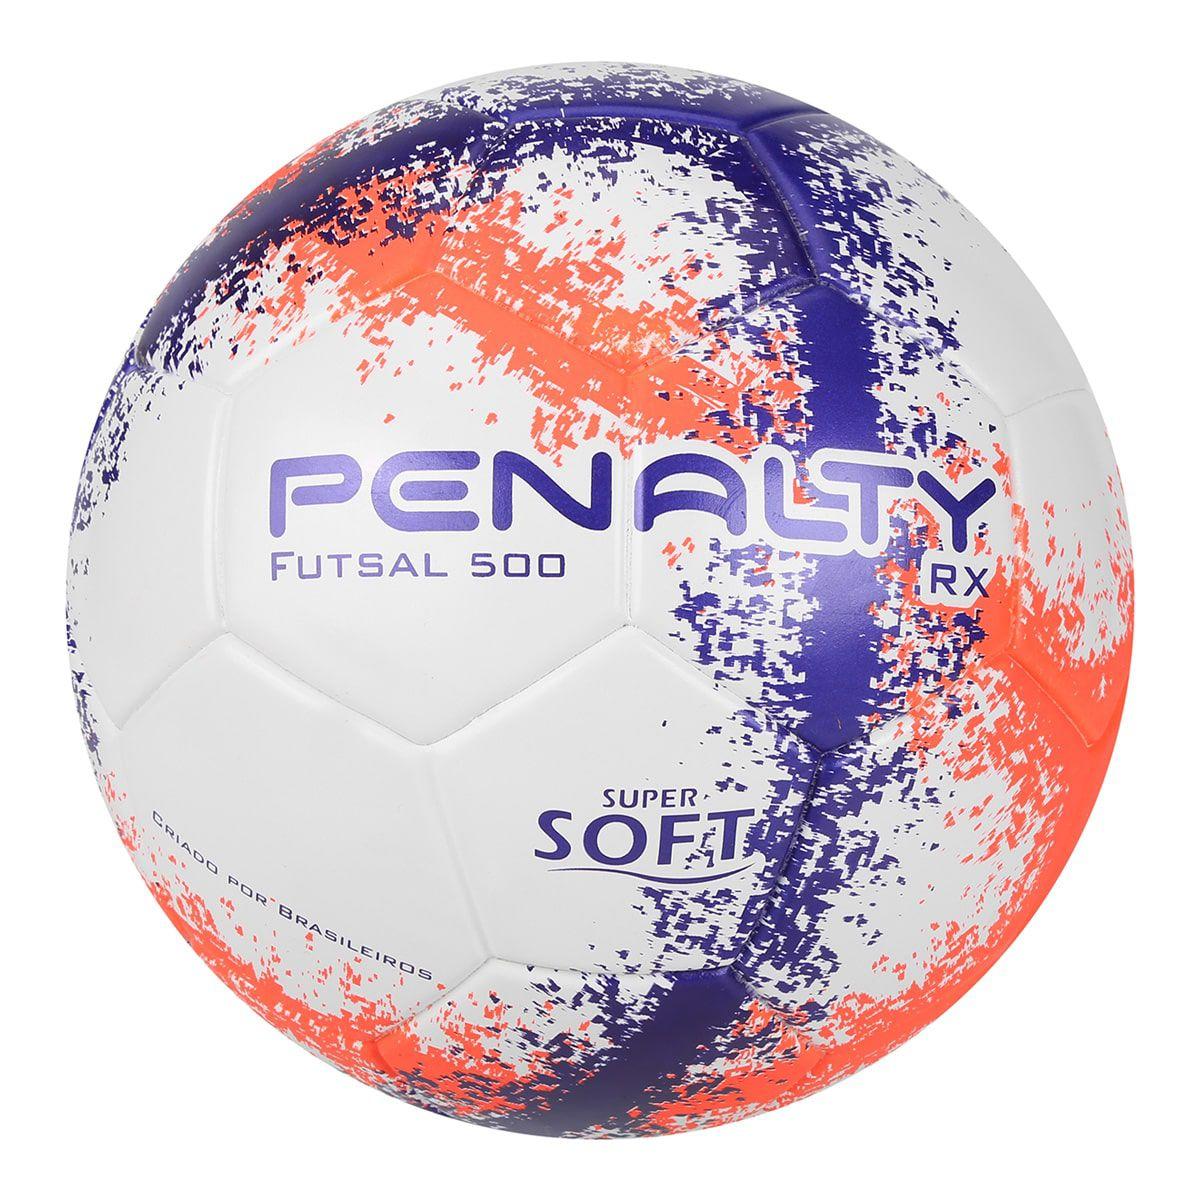 Kit C/3 Bolas Futsal Penalty RX 500 R3 Fusion VIII